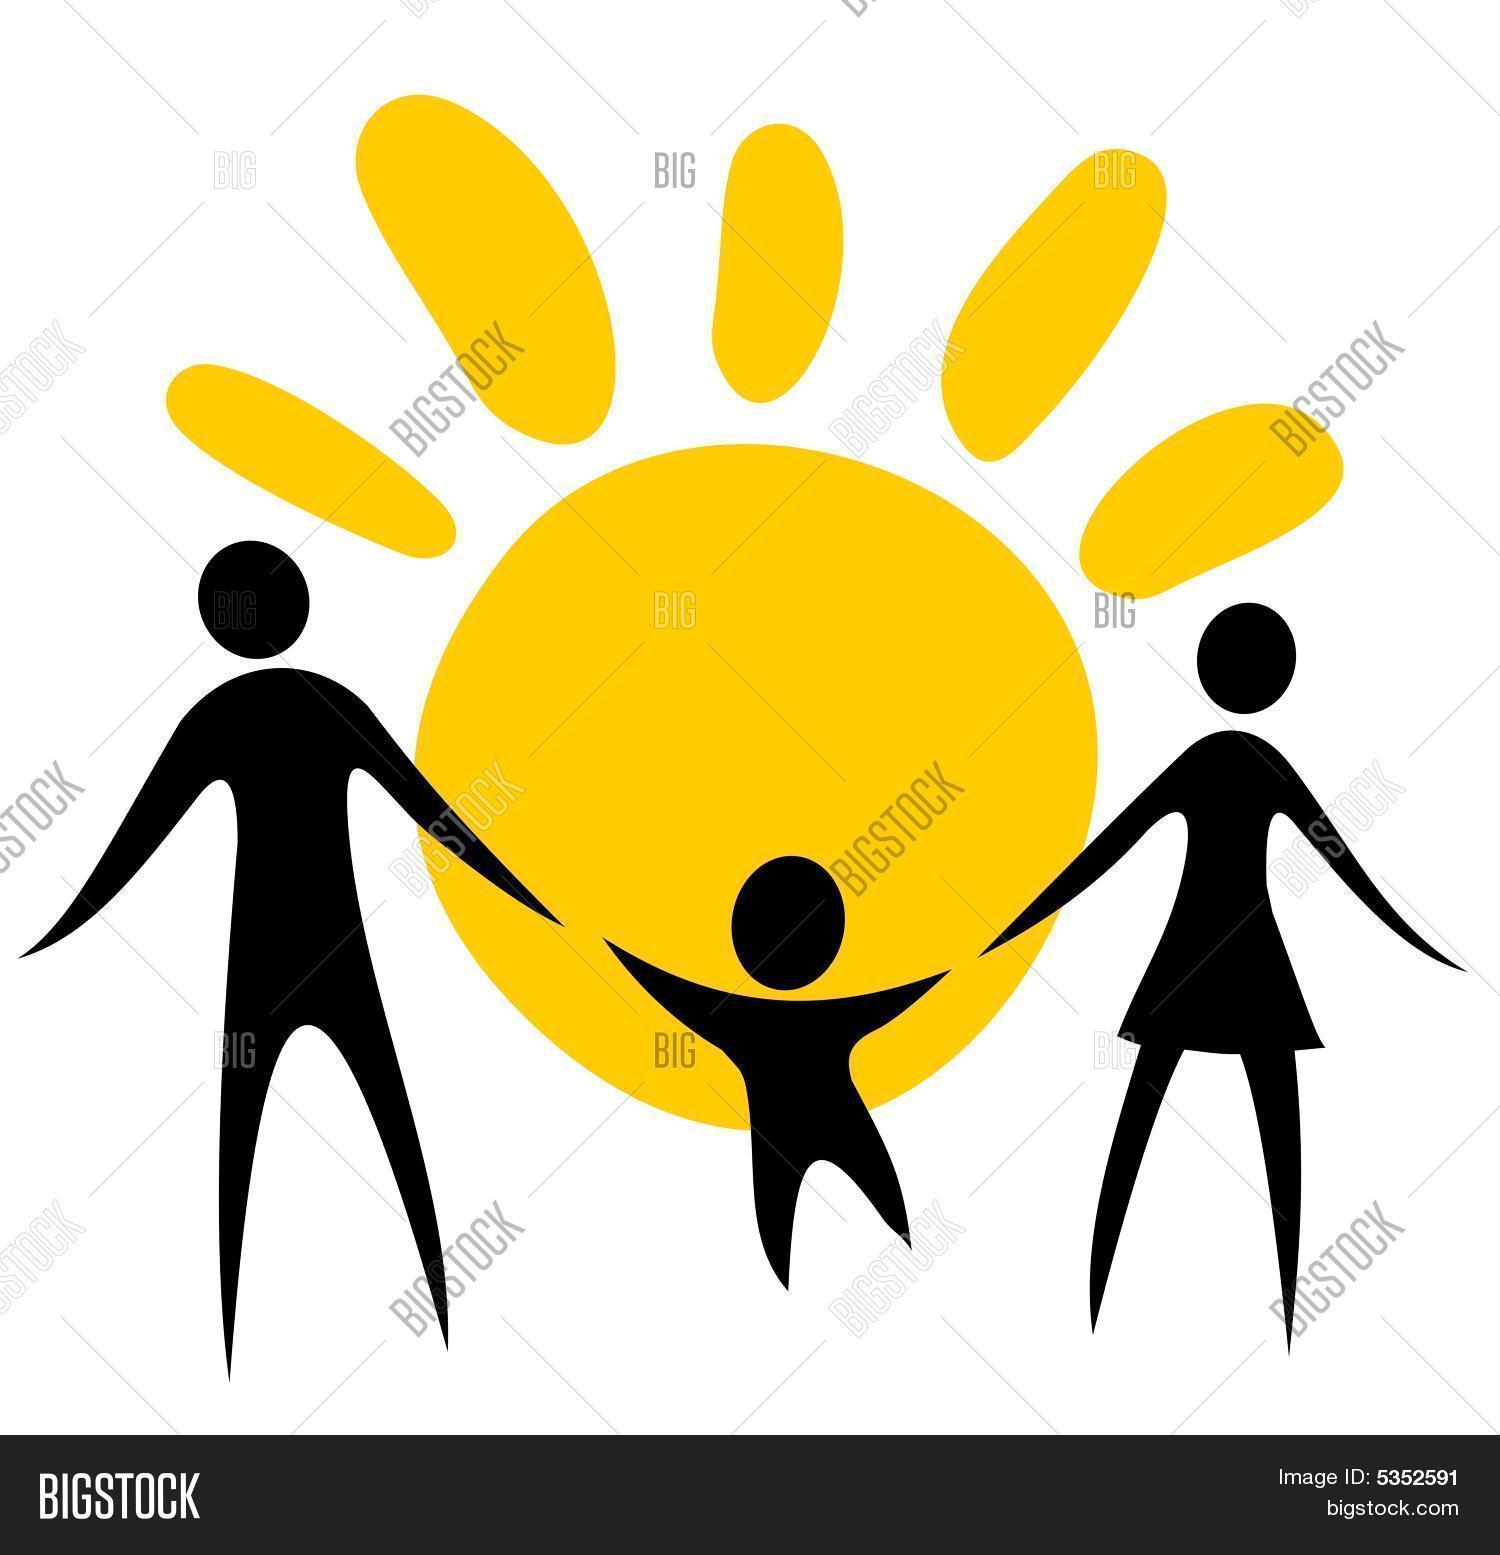 Family Symbol Image Photo Free Trial Bigstock